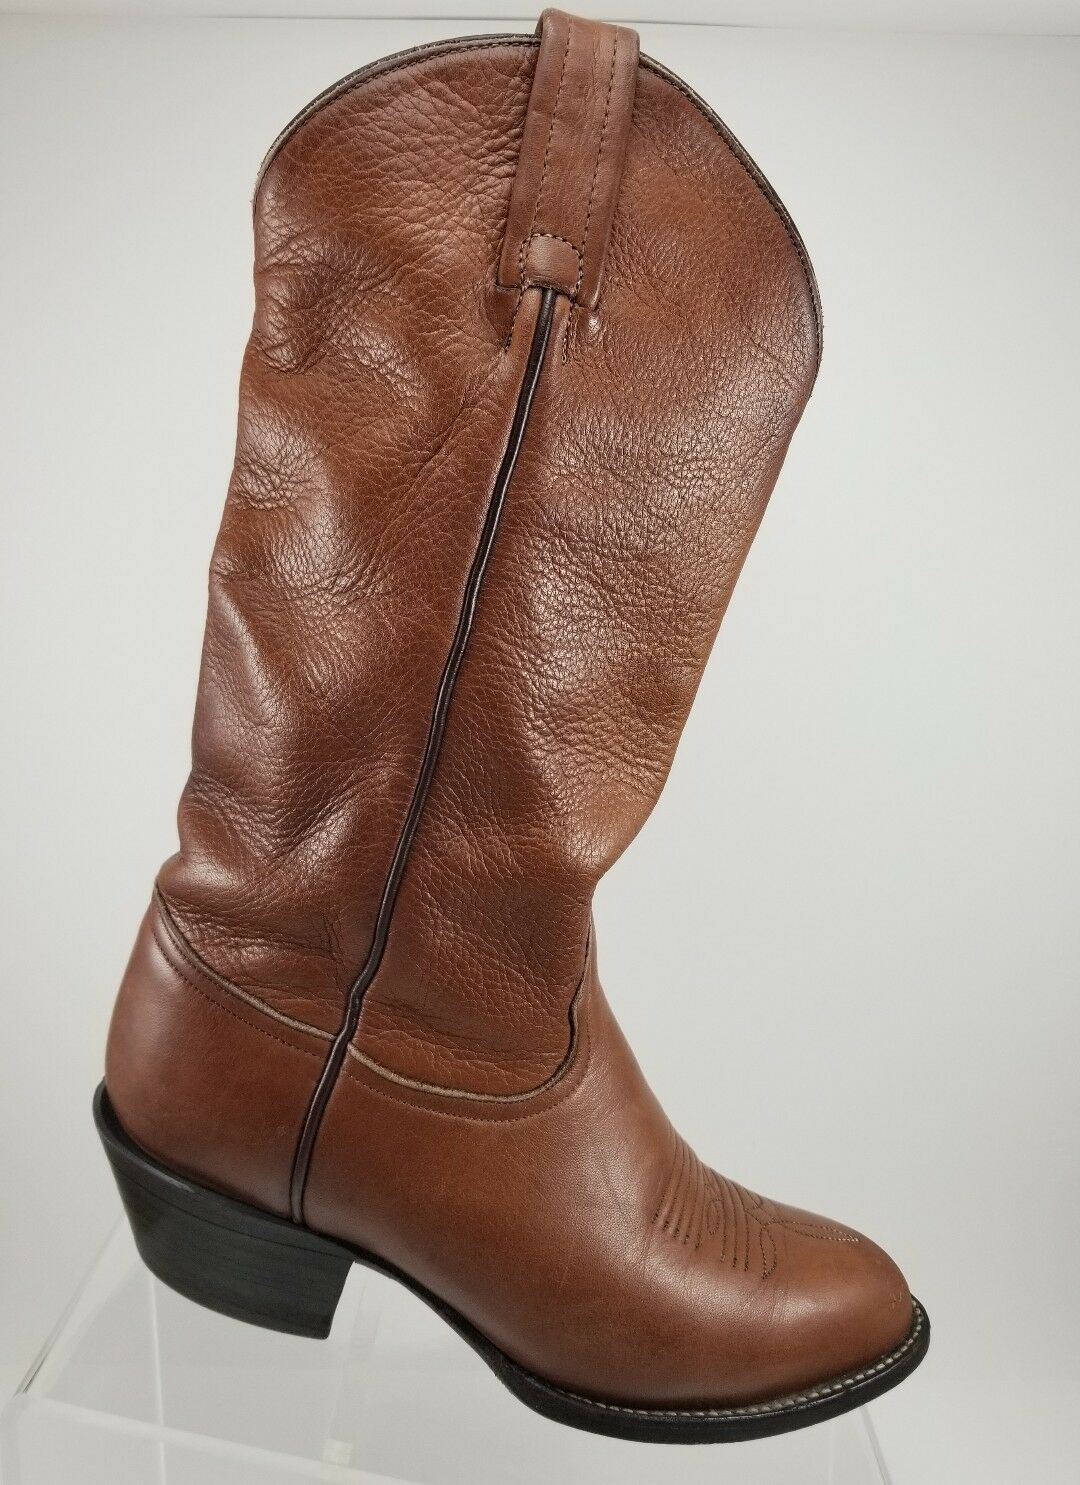 Tony Lama Stiefel Braun Pebbled Leder Mid-Calf Western Stiefel Lama Damenschuhe 5.5M 1013 8258b0